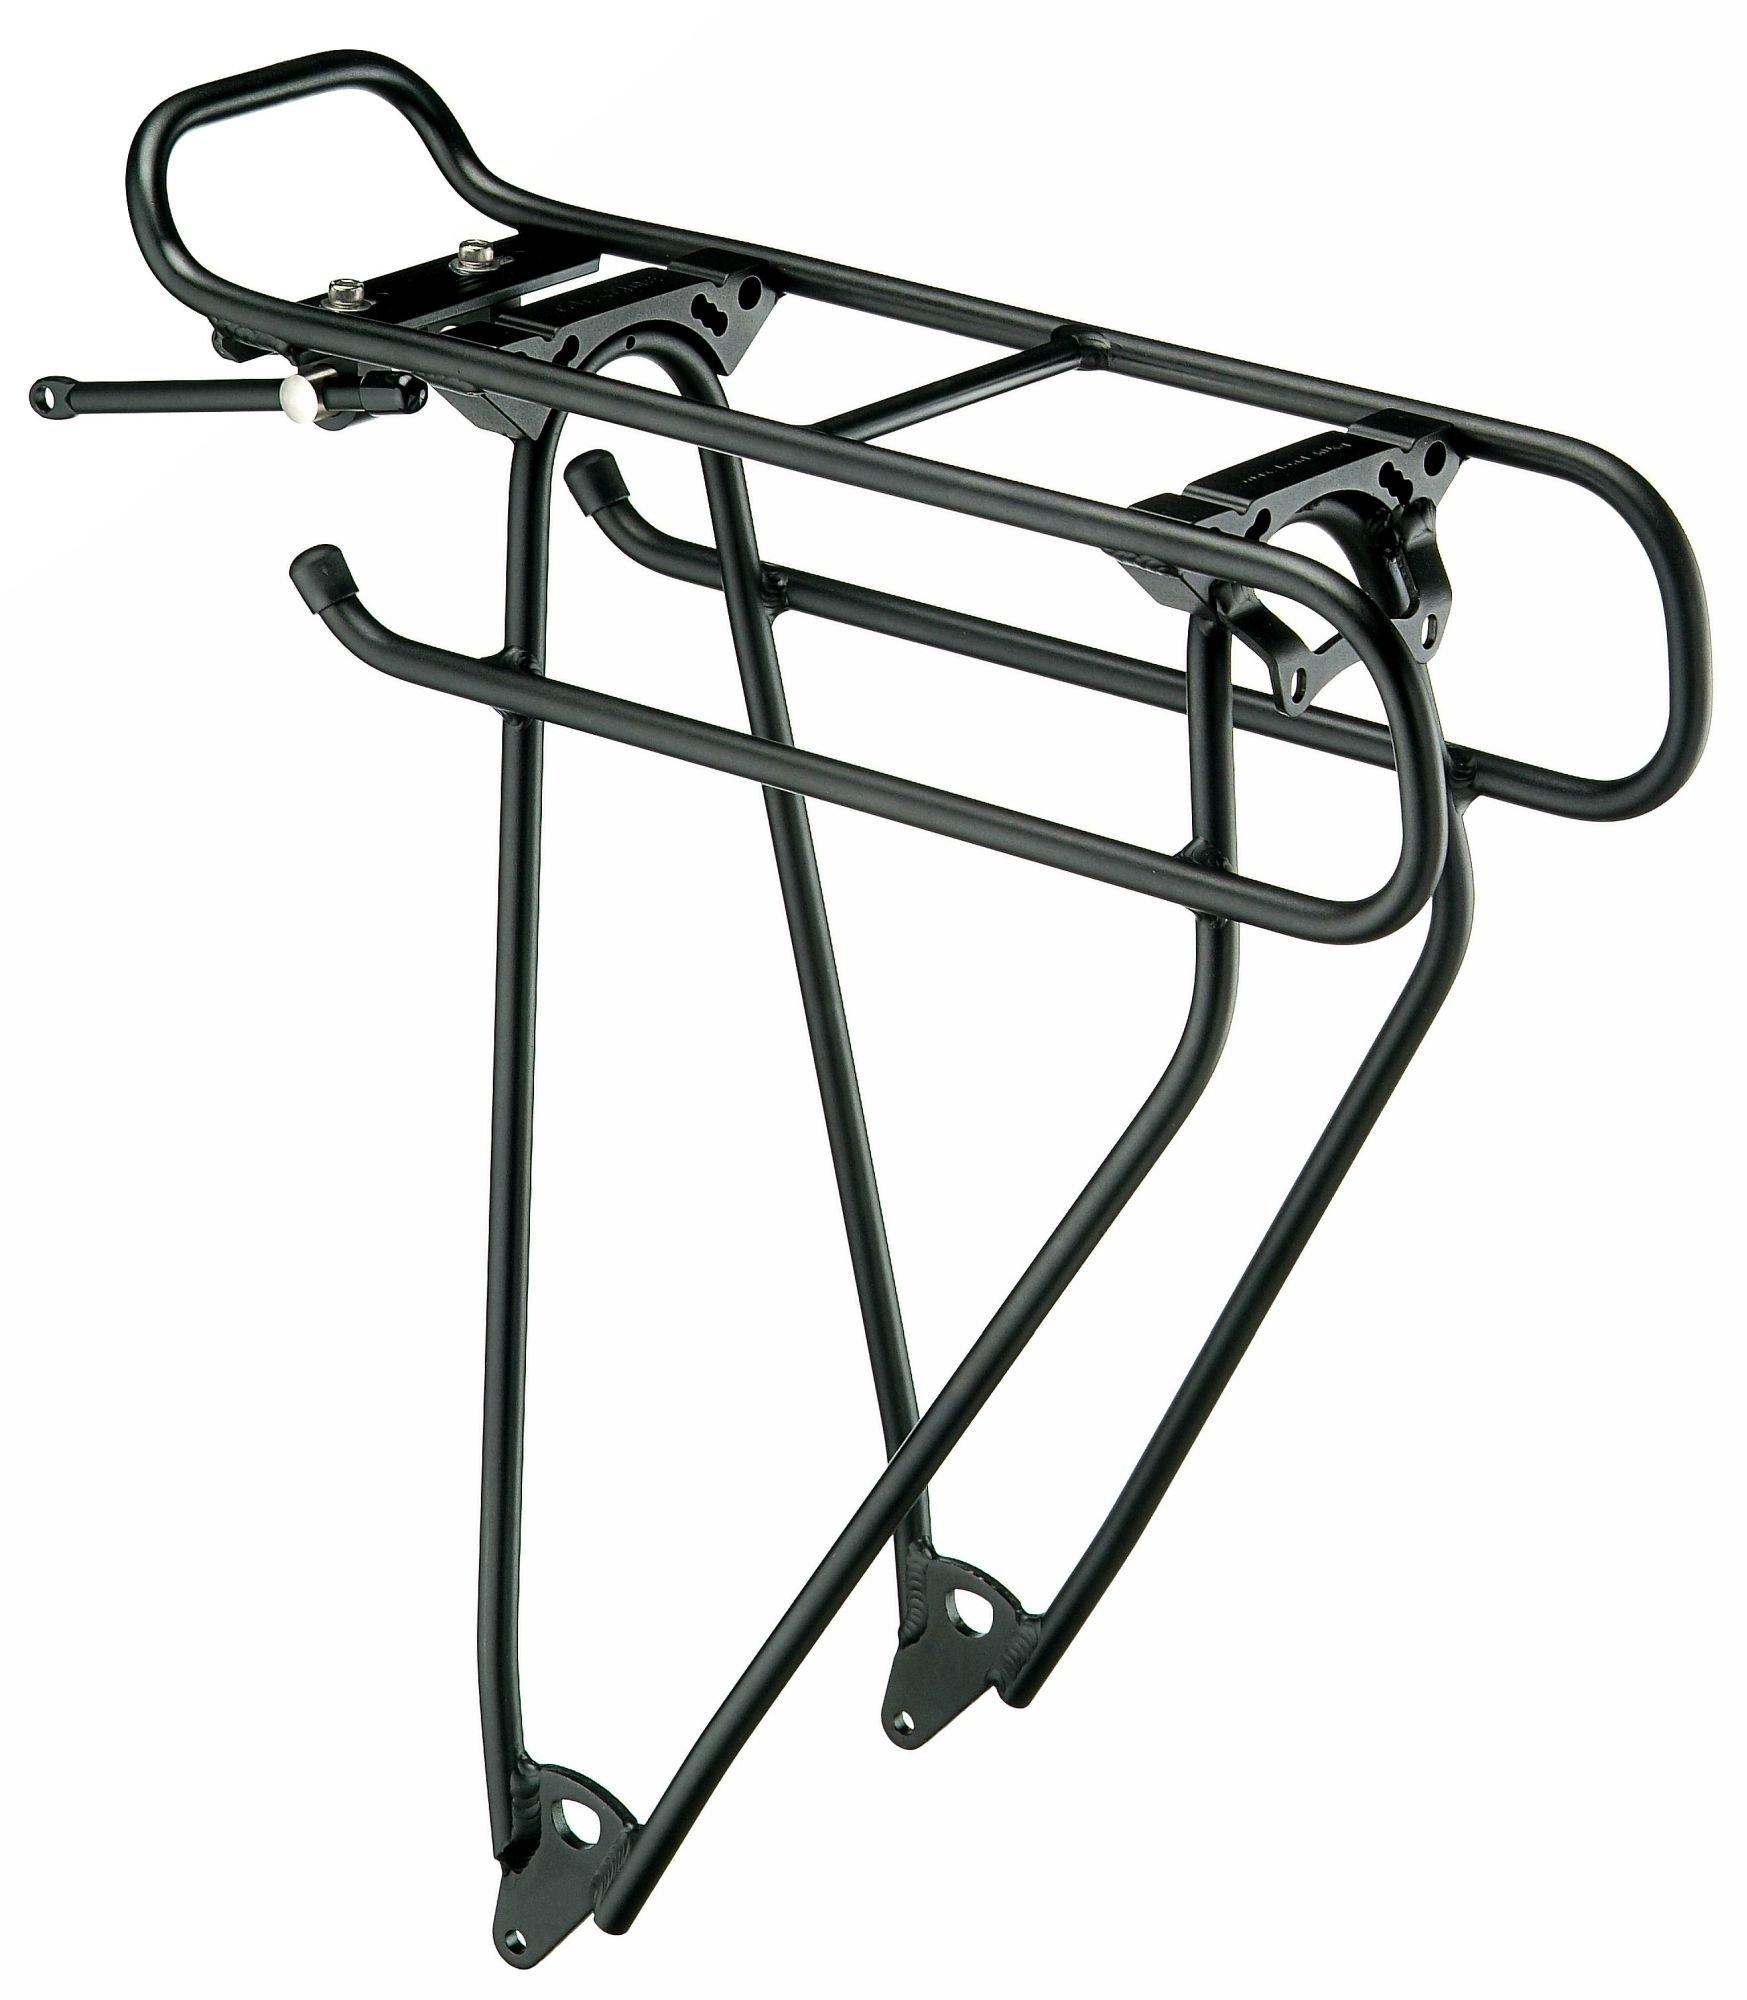 Fahrradteile/Gepäckträger: Racktime  Addit Gepäckträger 26-28 Zoll sw 26-28 Zoll